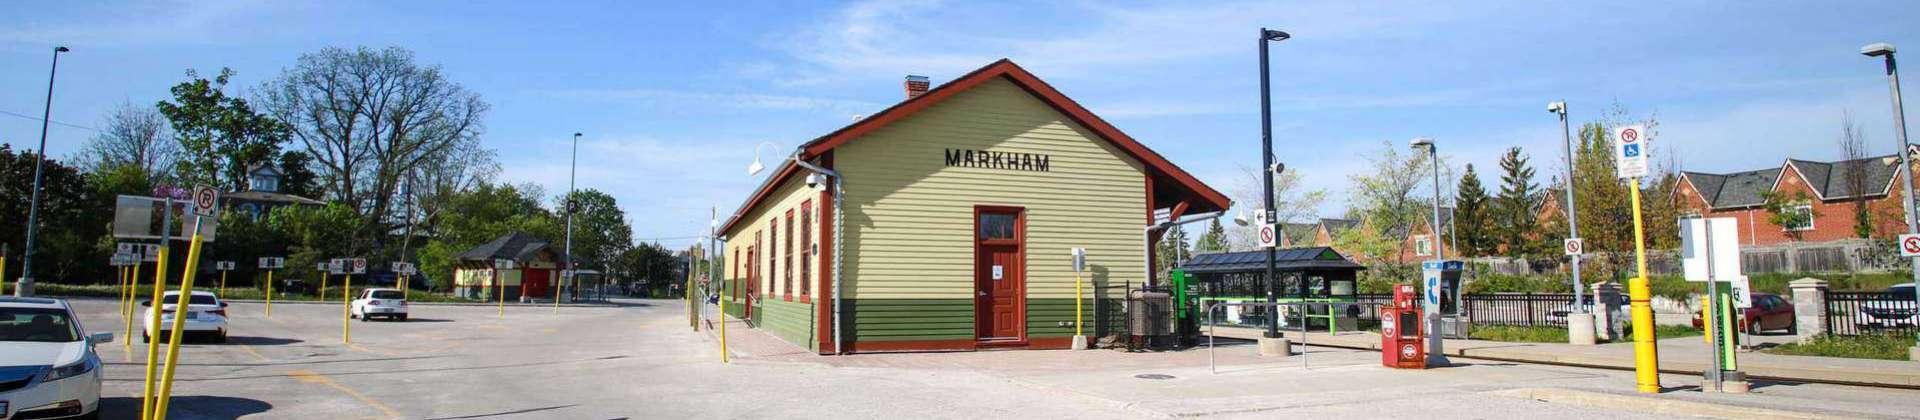 Markham Ontario train station